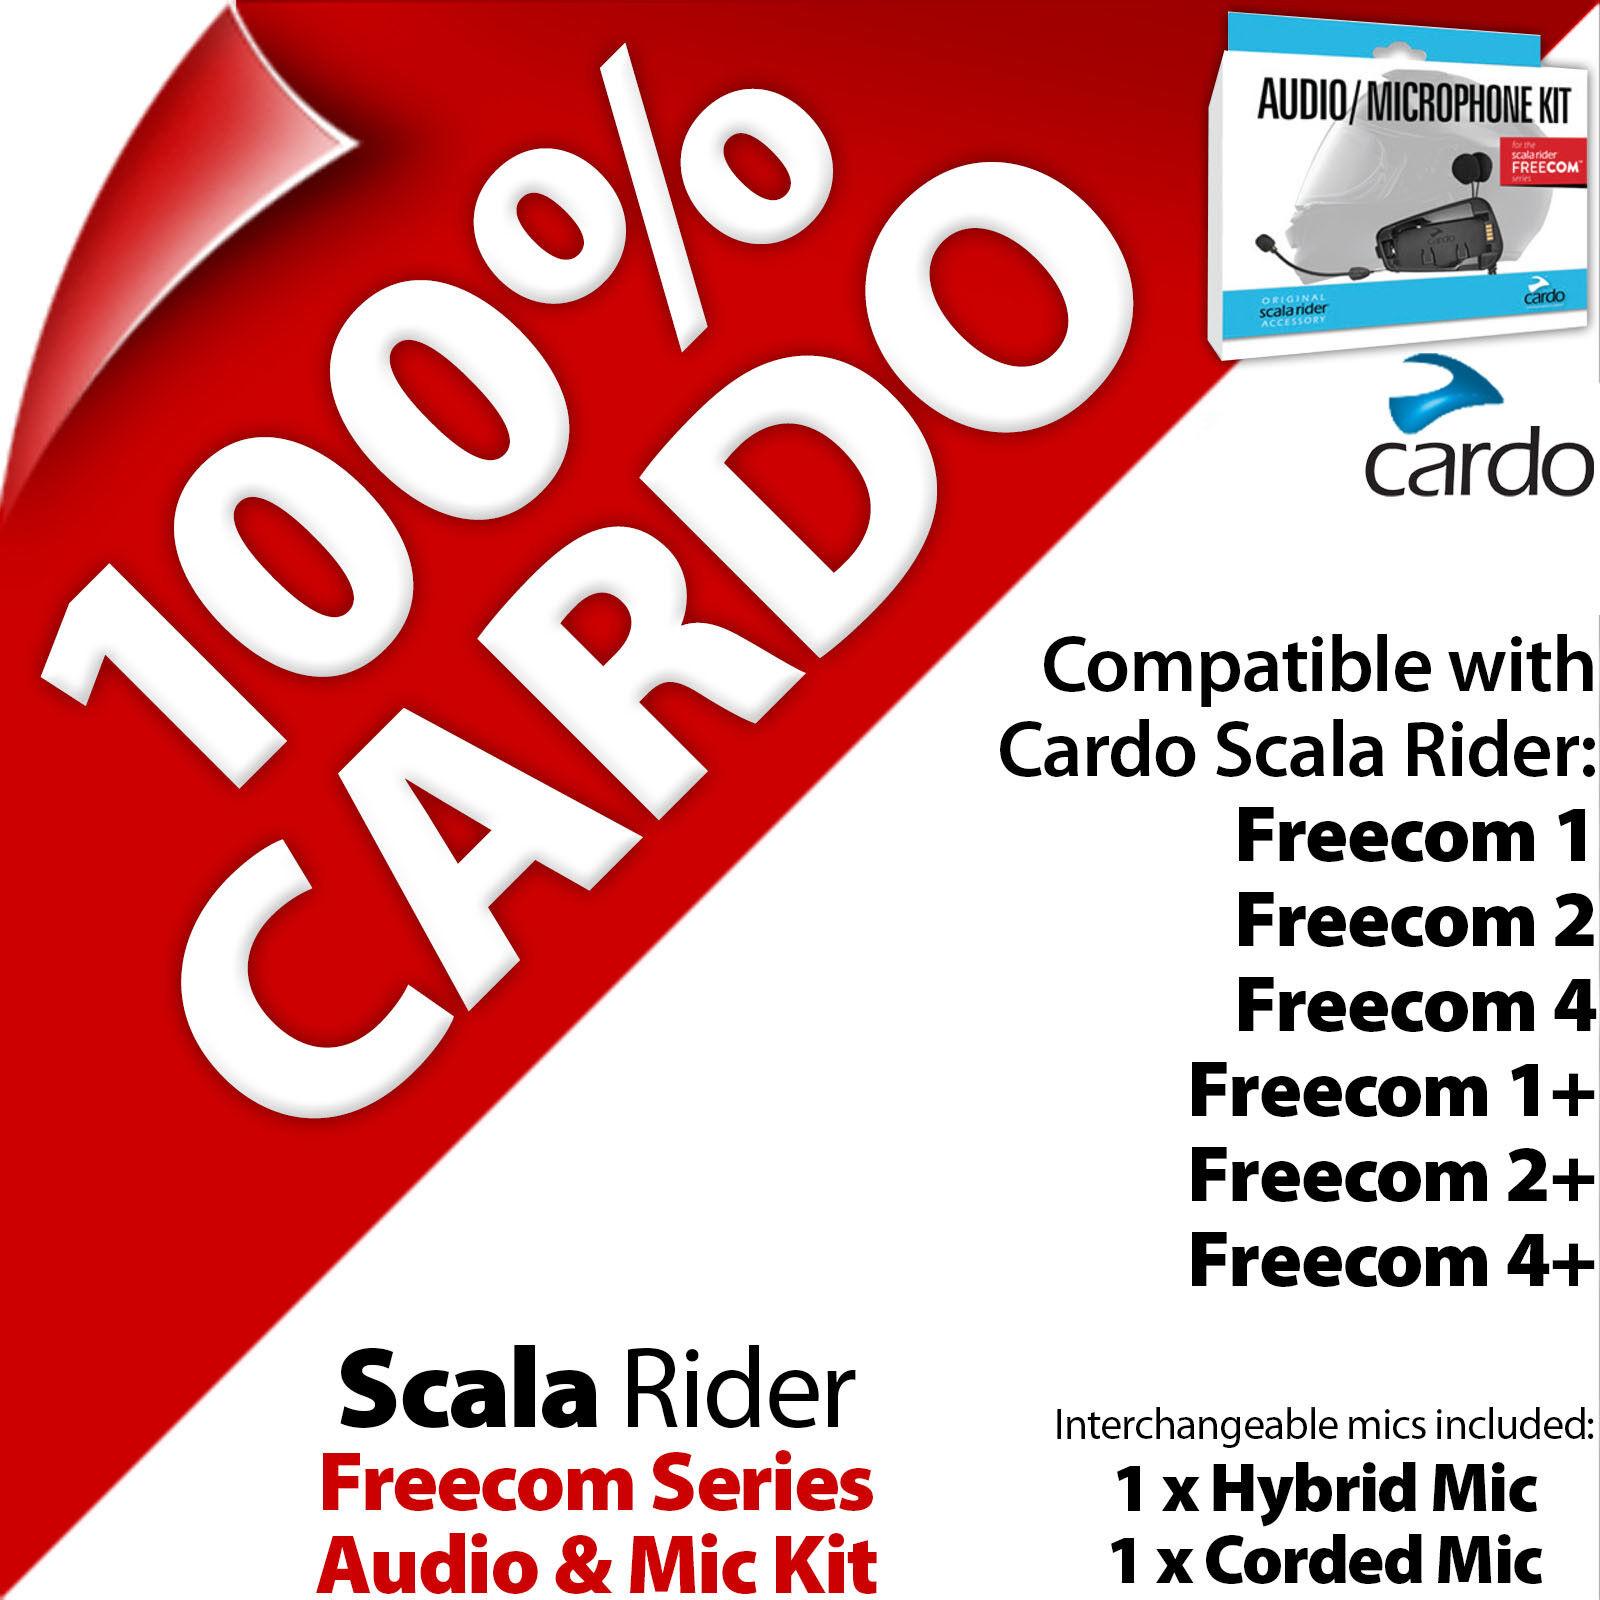 d837175f2da Cardo Scala Rider Audio & Mic Kit for Freecom 1 2 3 4 Helmet Intercom for  sale online | eBay